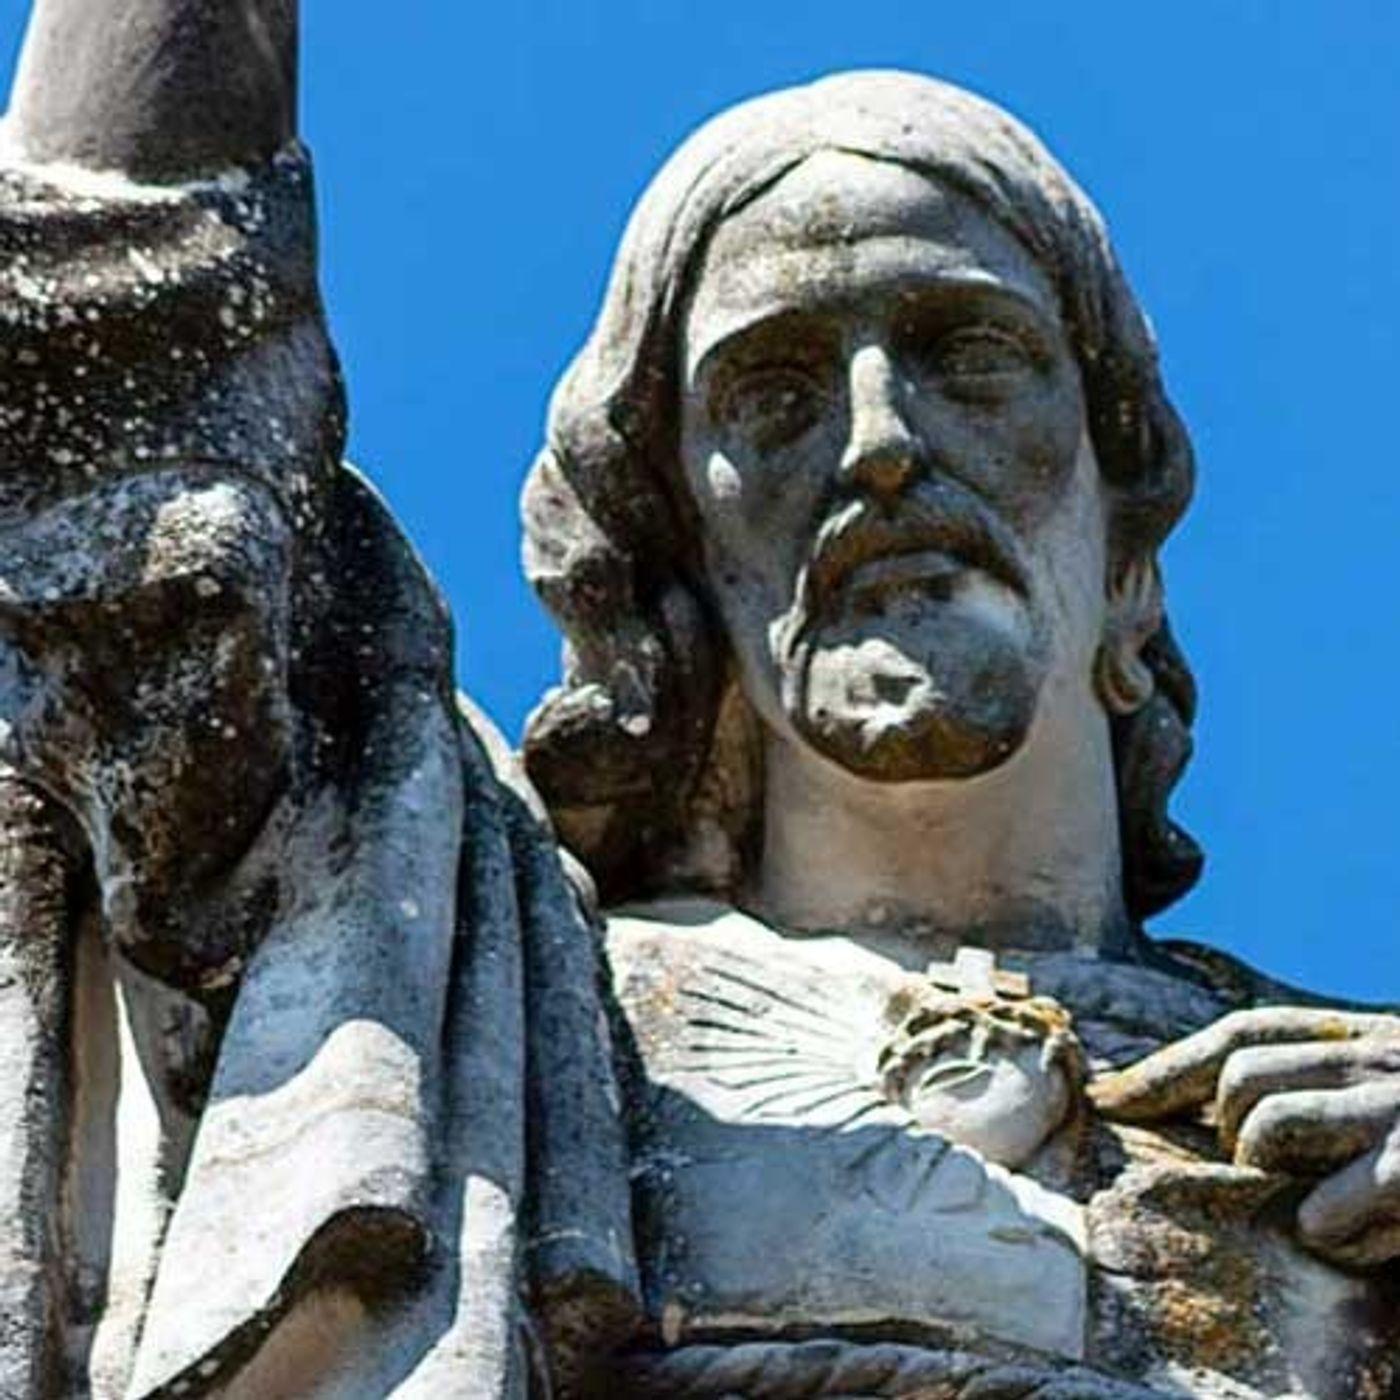 155 - I devoti al Sacro Cuore